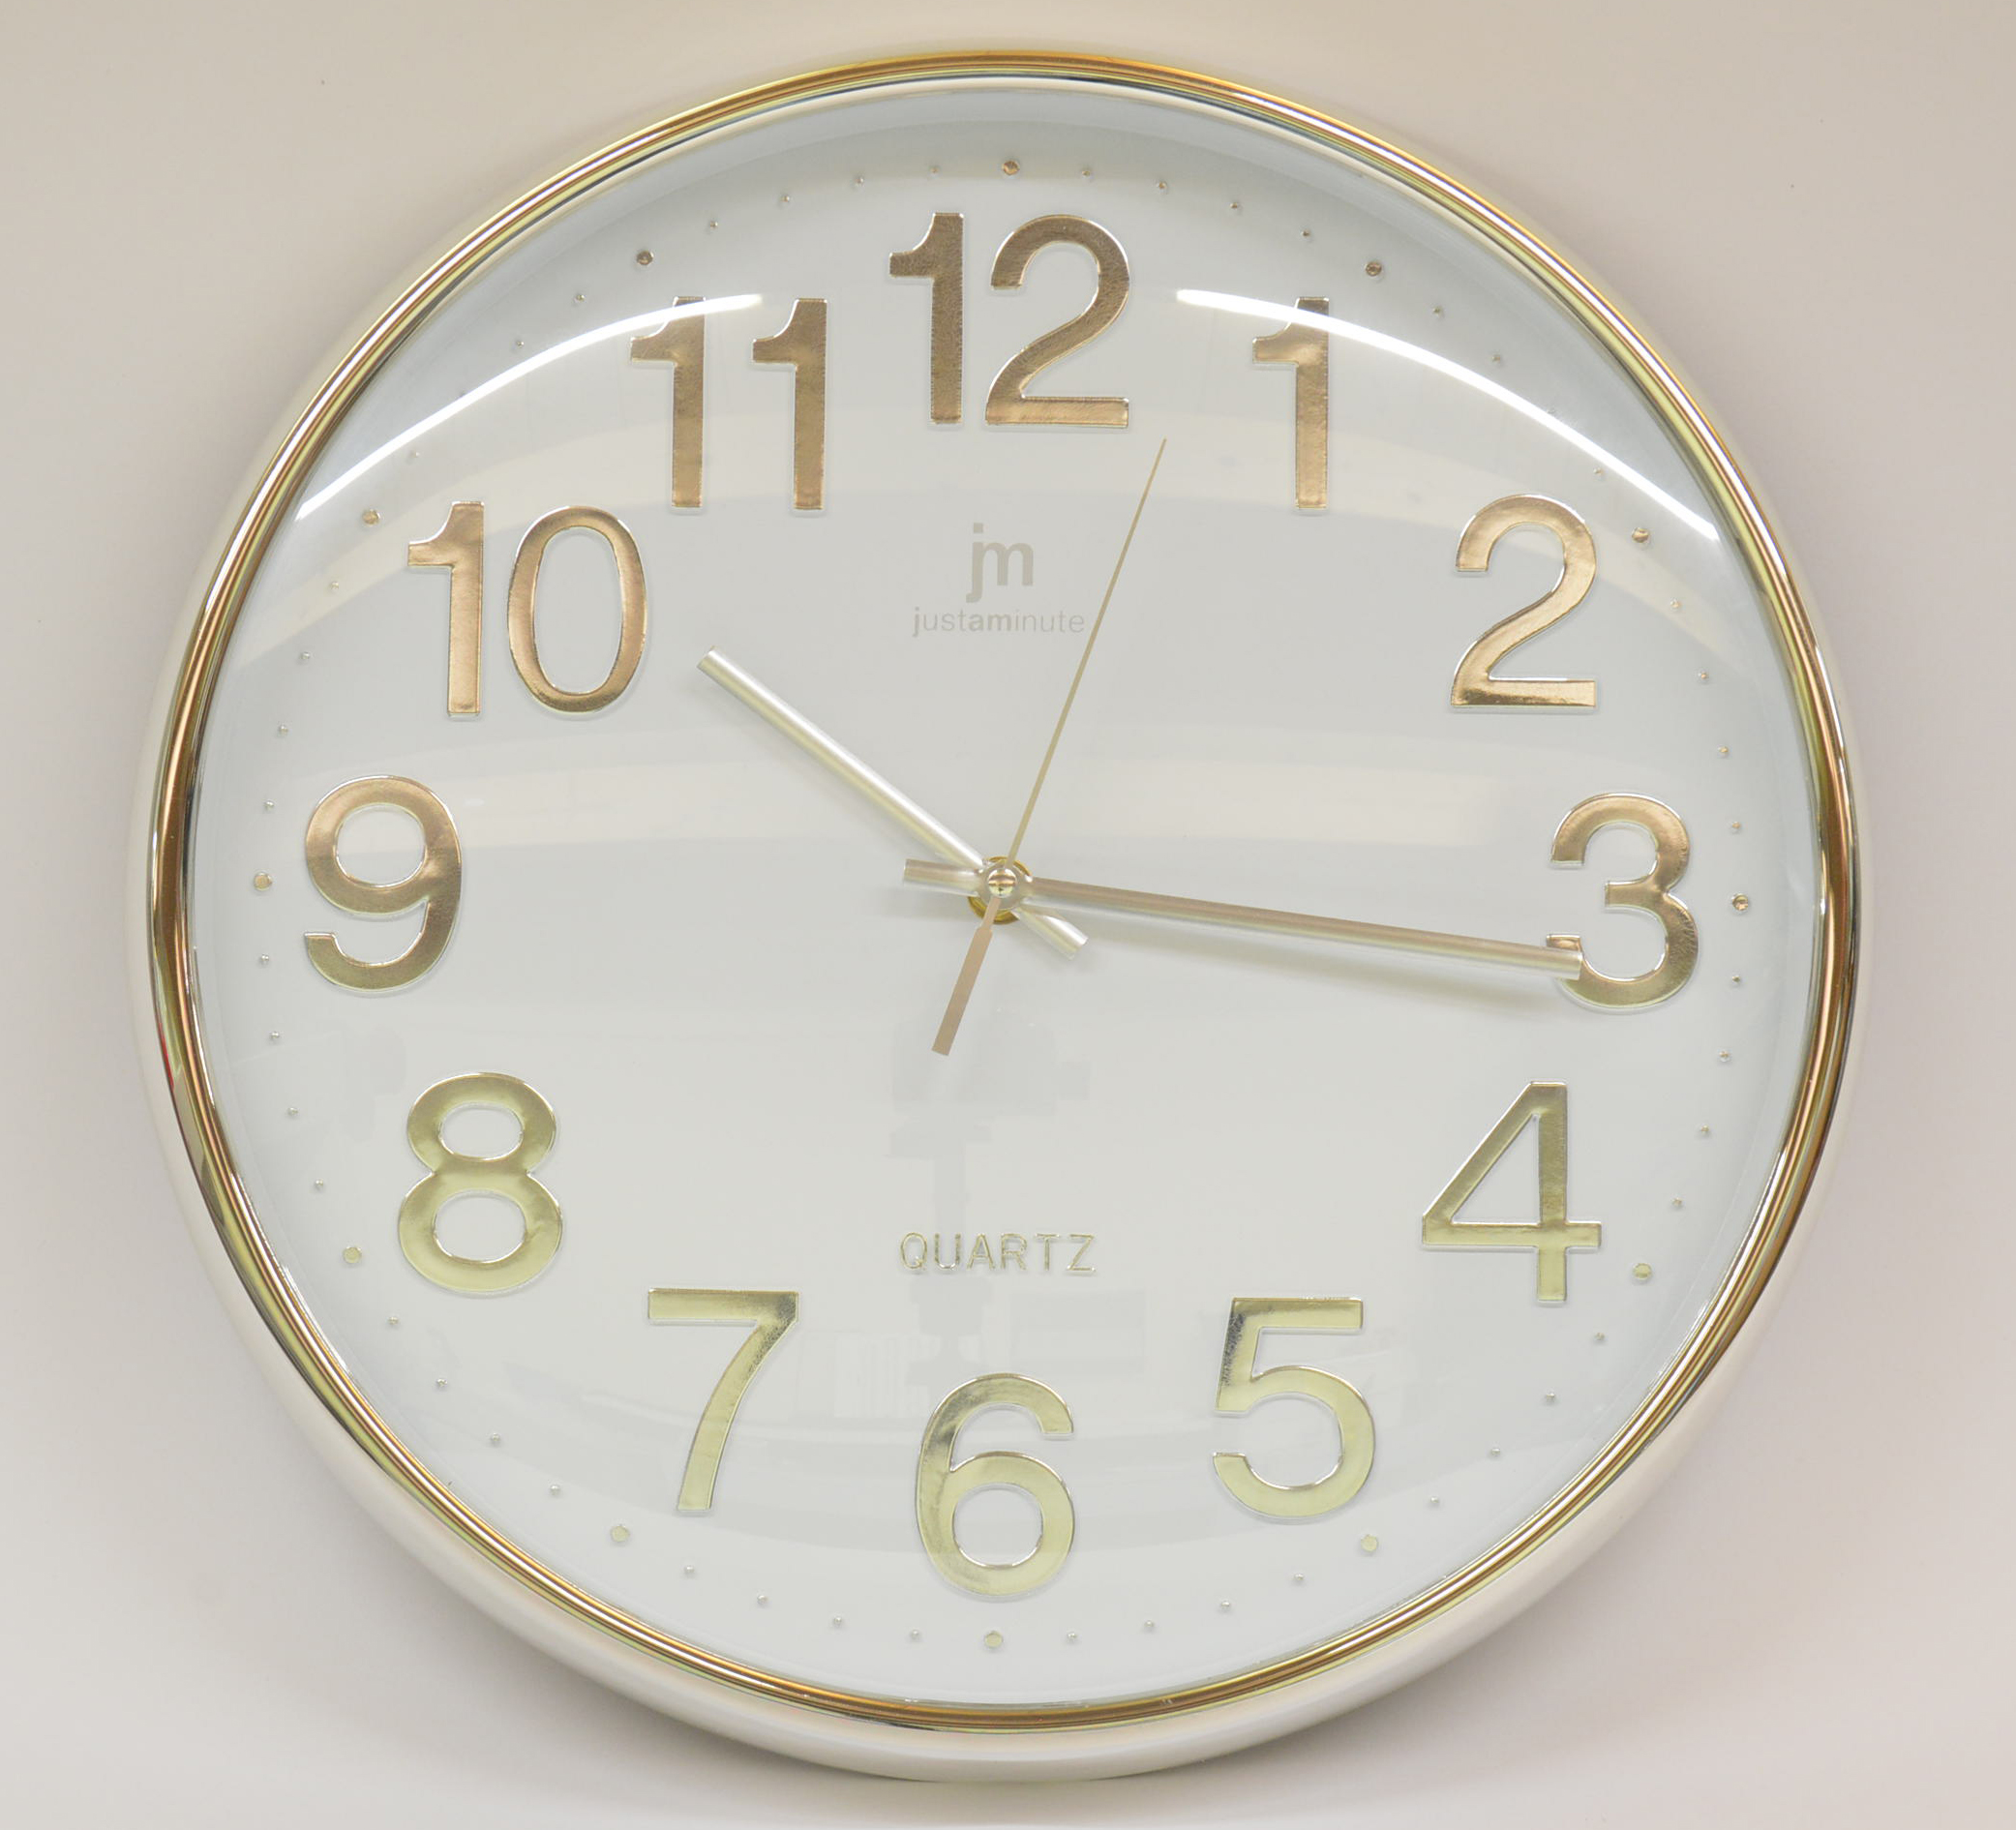 Orologio da parete JM diametro 35 cm art. 00816B Cromato Bianco